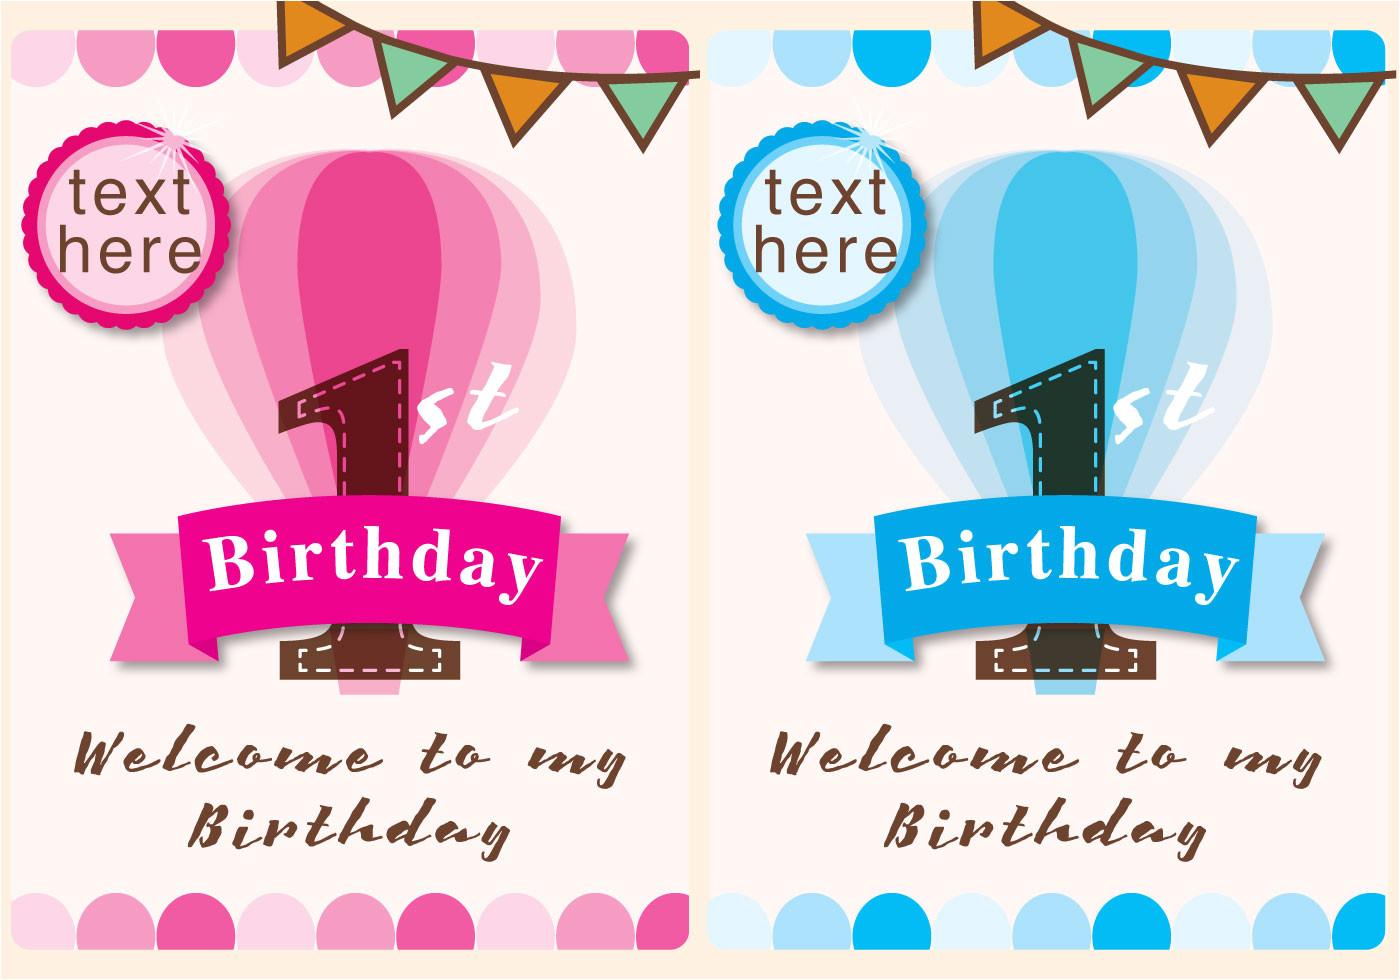 101622 invitation 1st birthday girl and boy